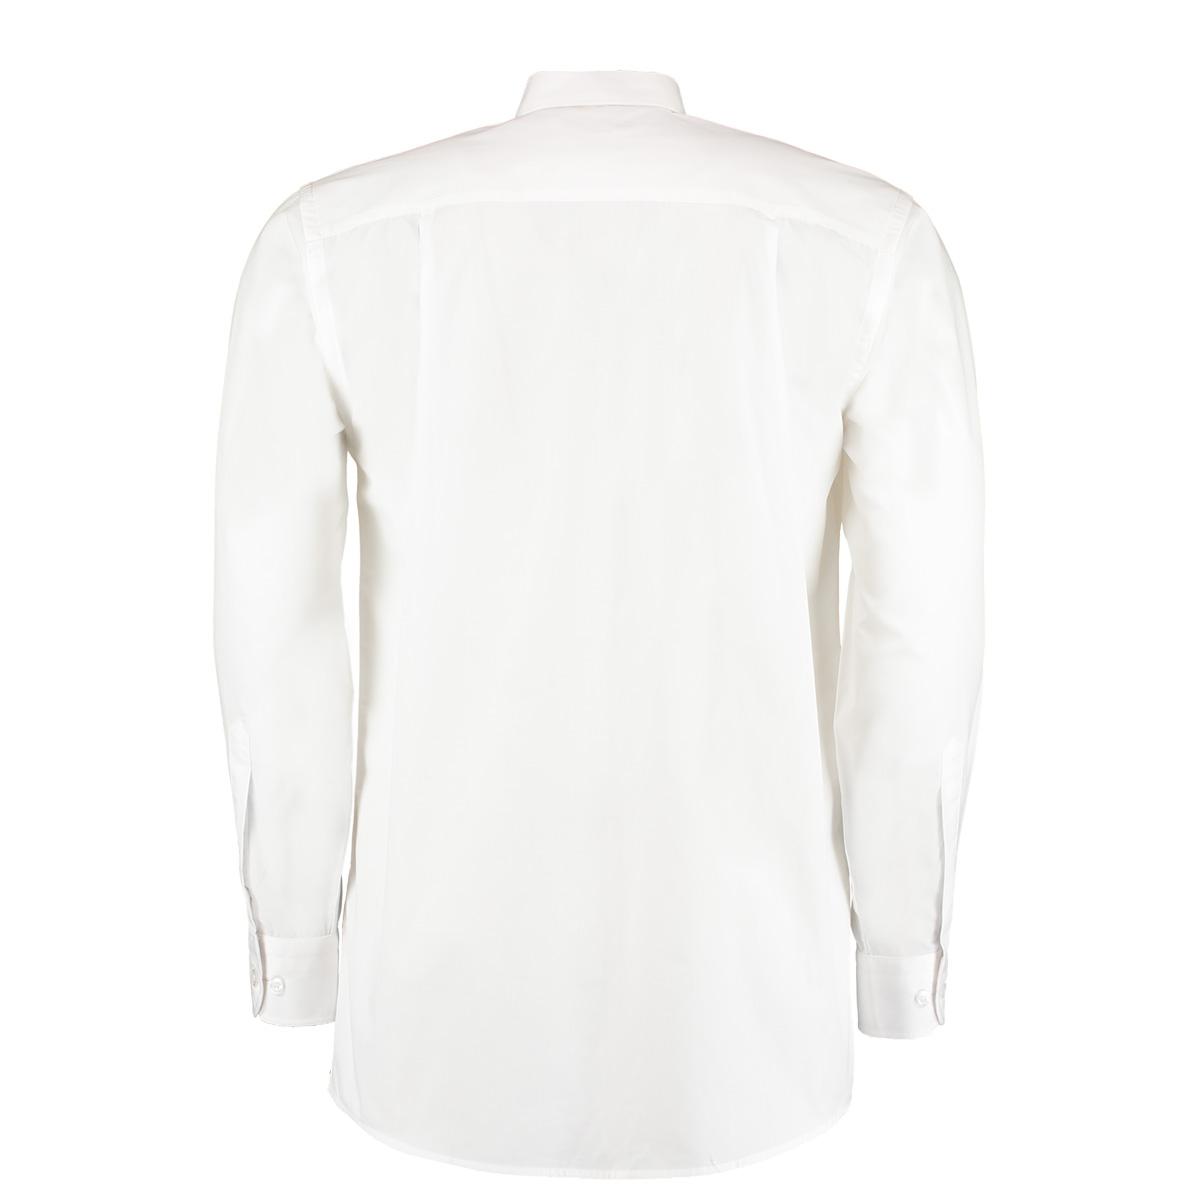 Kustom Kit Mens Workforce Long Sleeve Shirt (XL) (White)